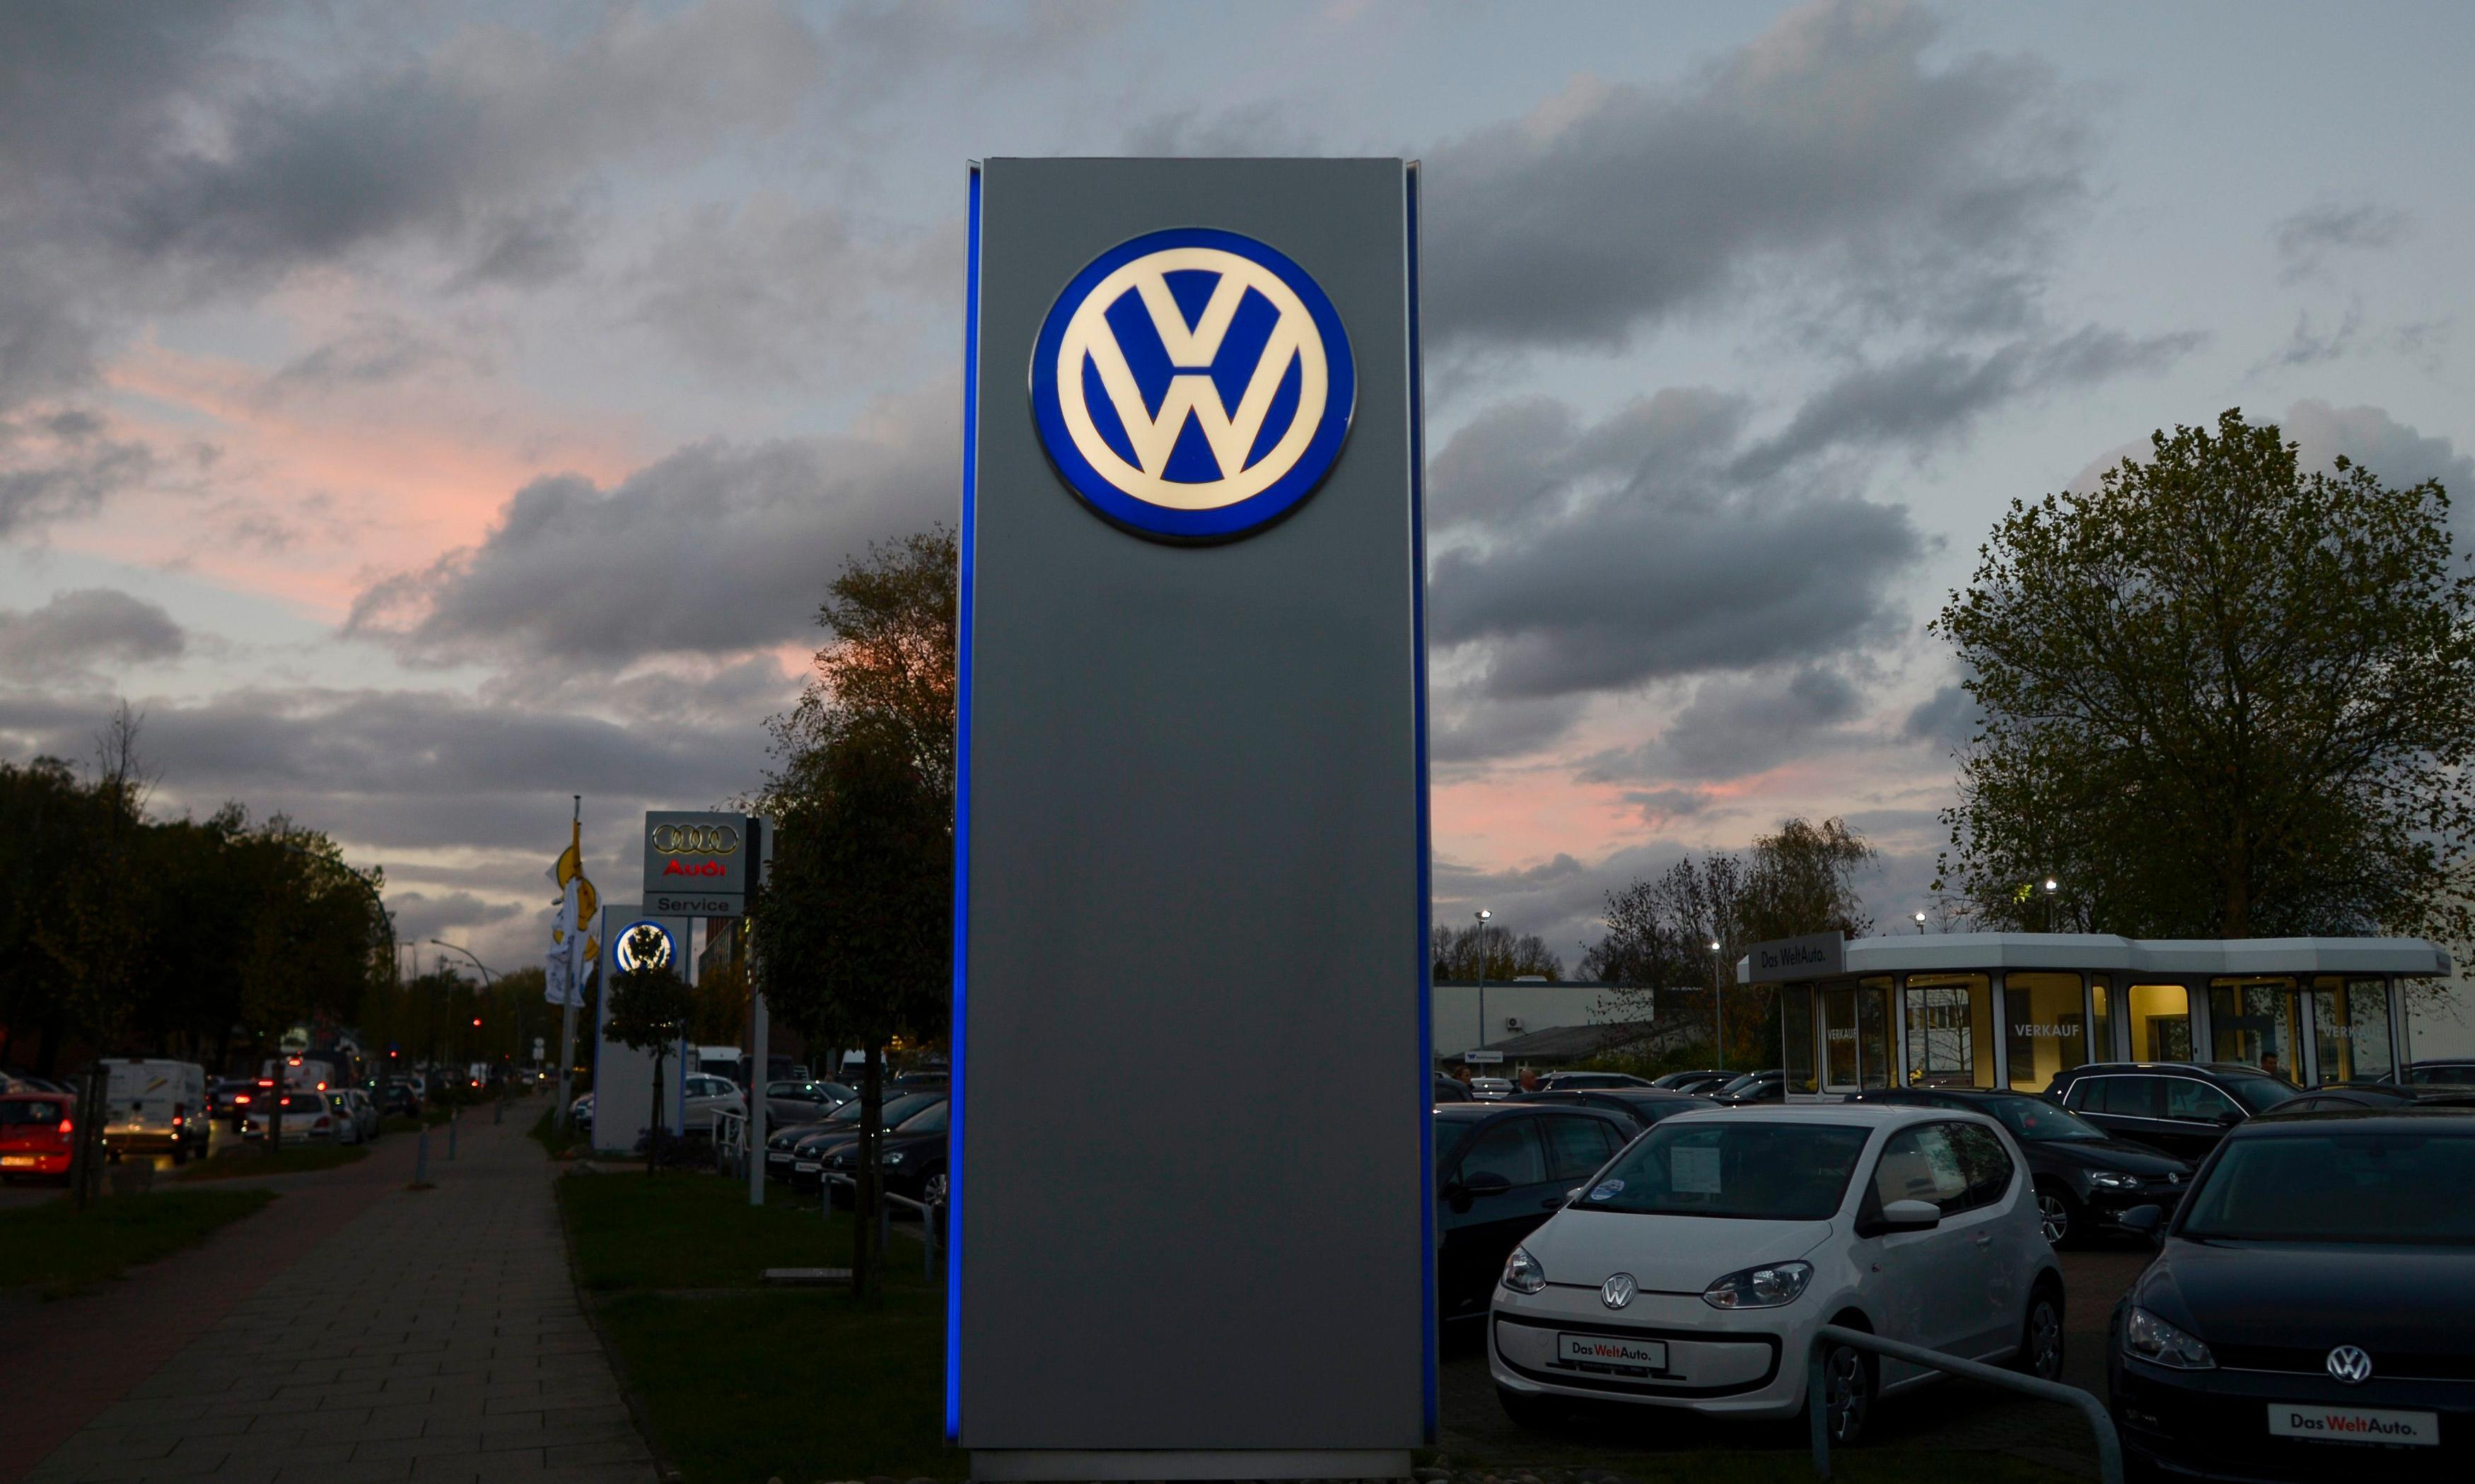 Volkswagen under investigation over illegal software that masks pollution